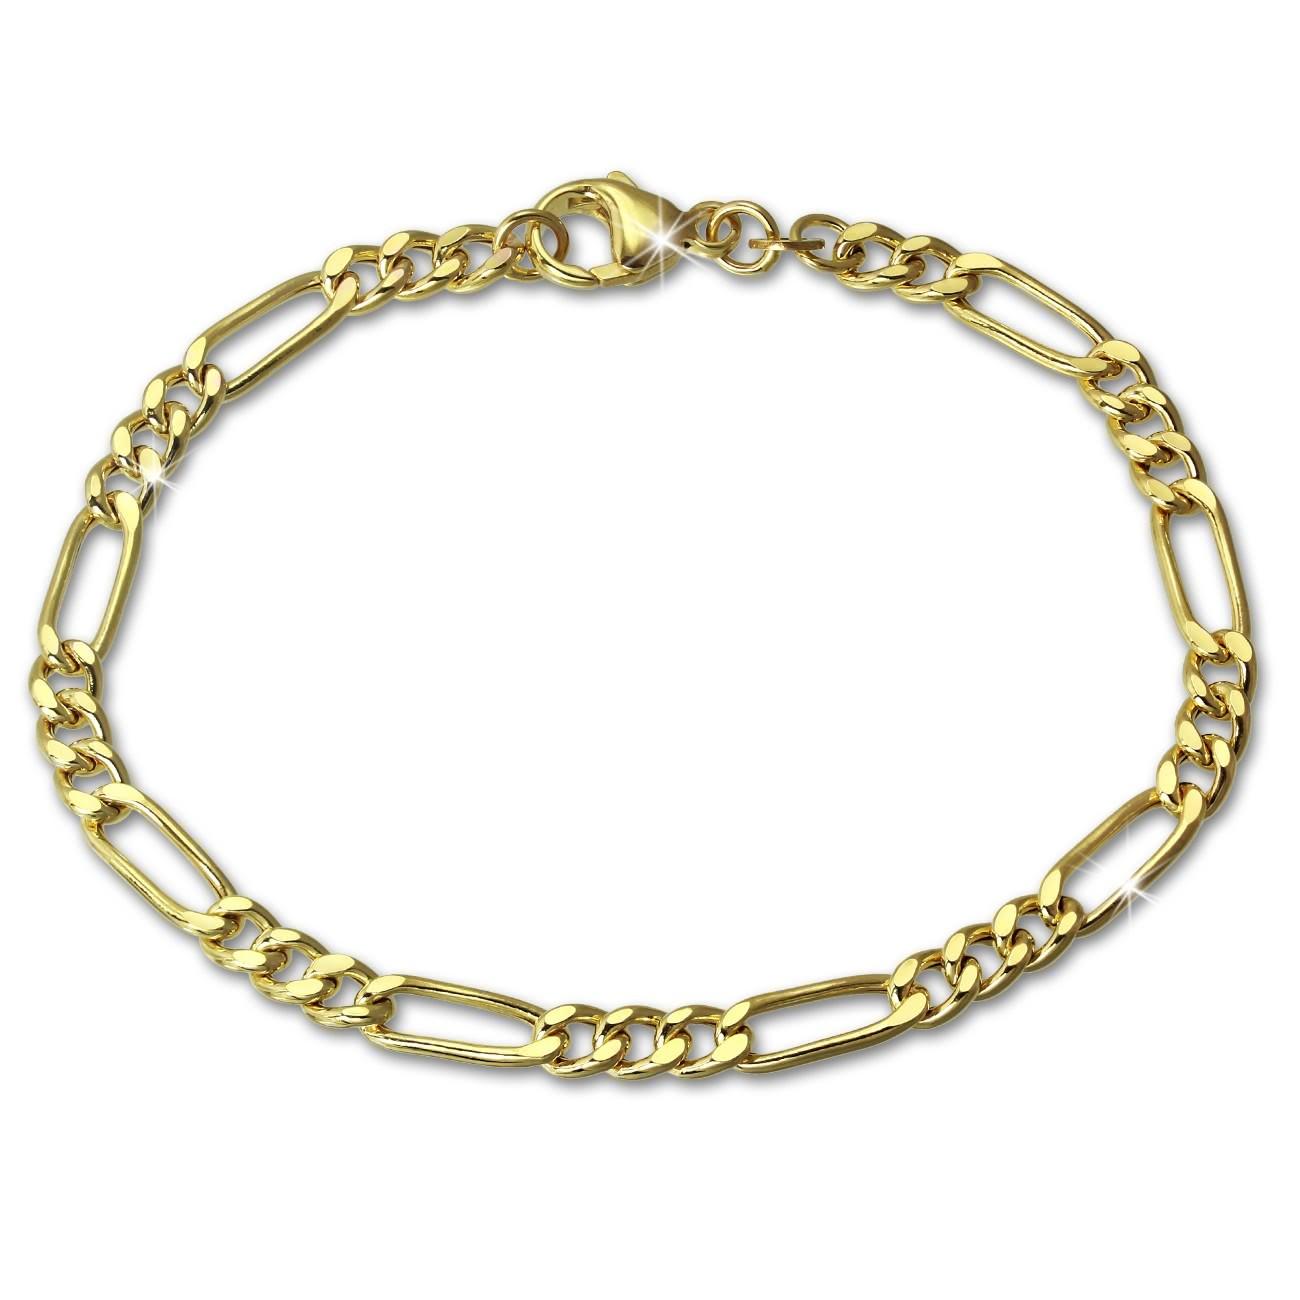 SilberDream Armband Figaro hohl 333 Gold 19cm 8 Karat GDA0369Y